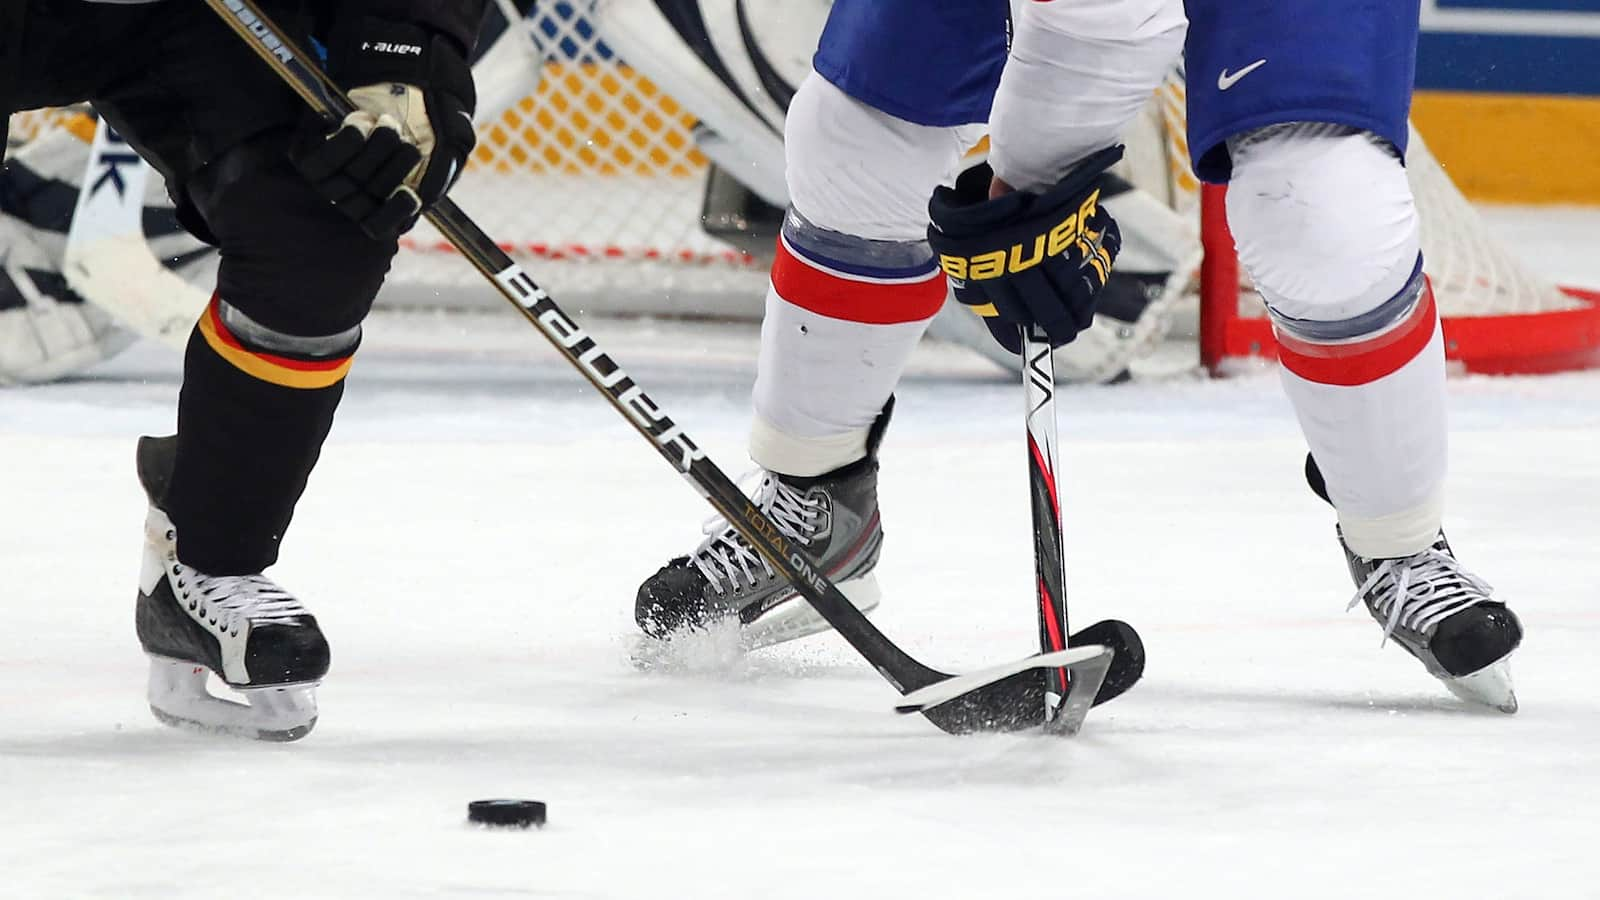 ishockey/sportmagasiner